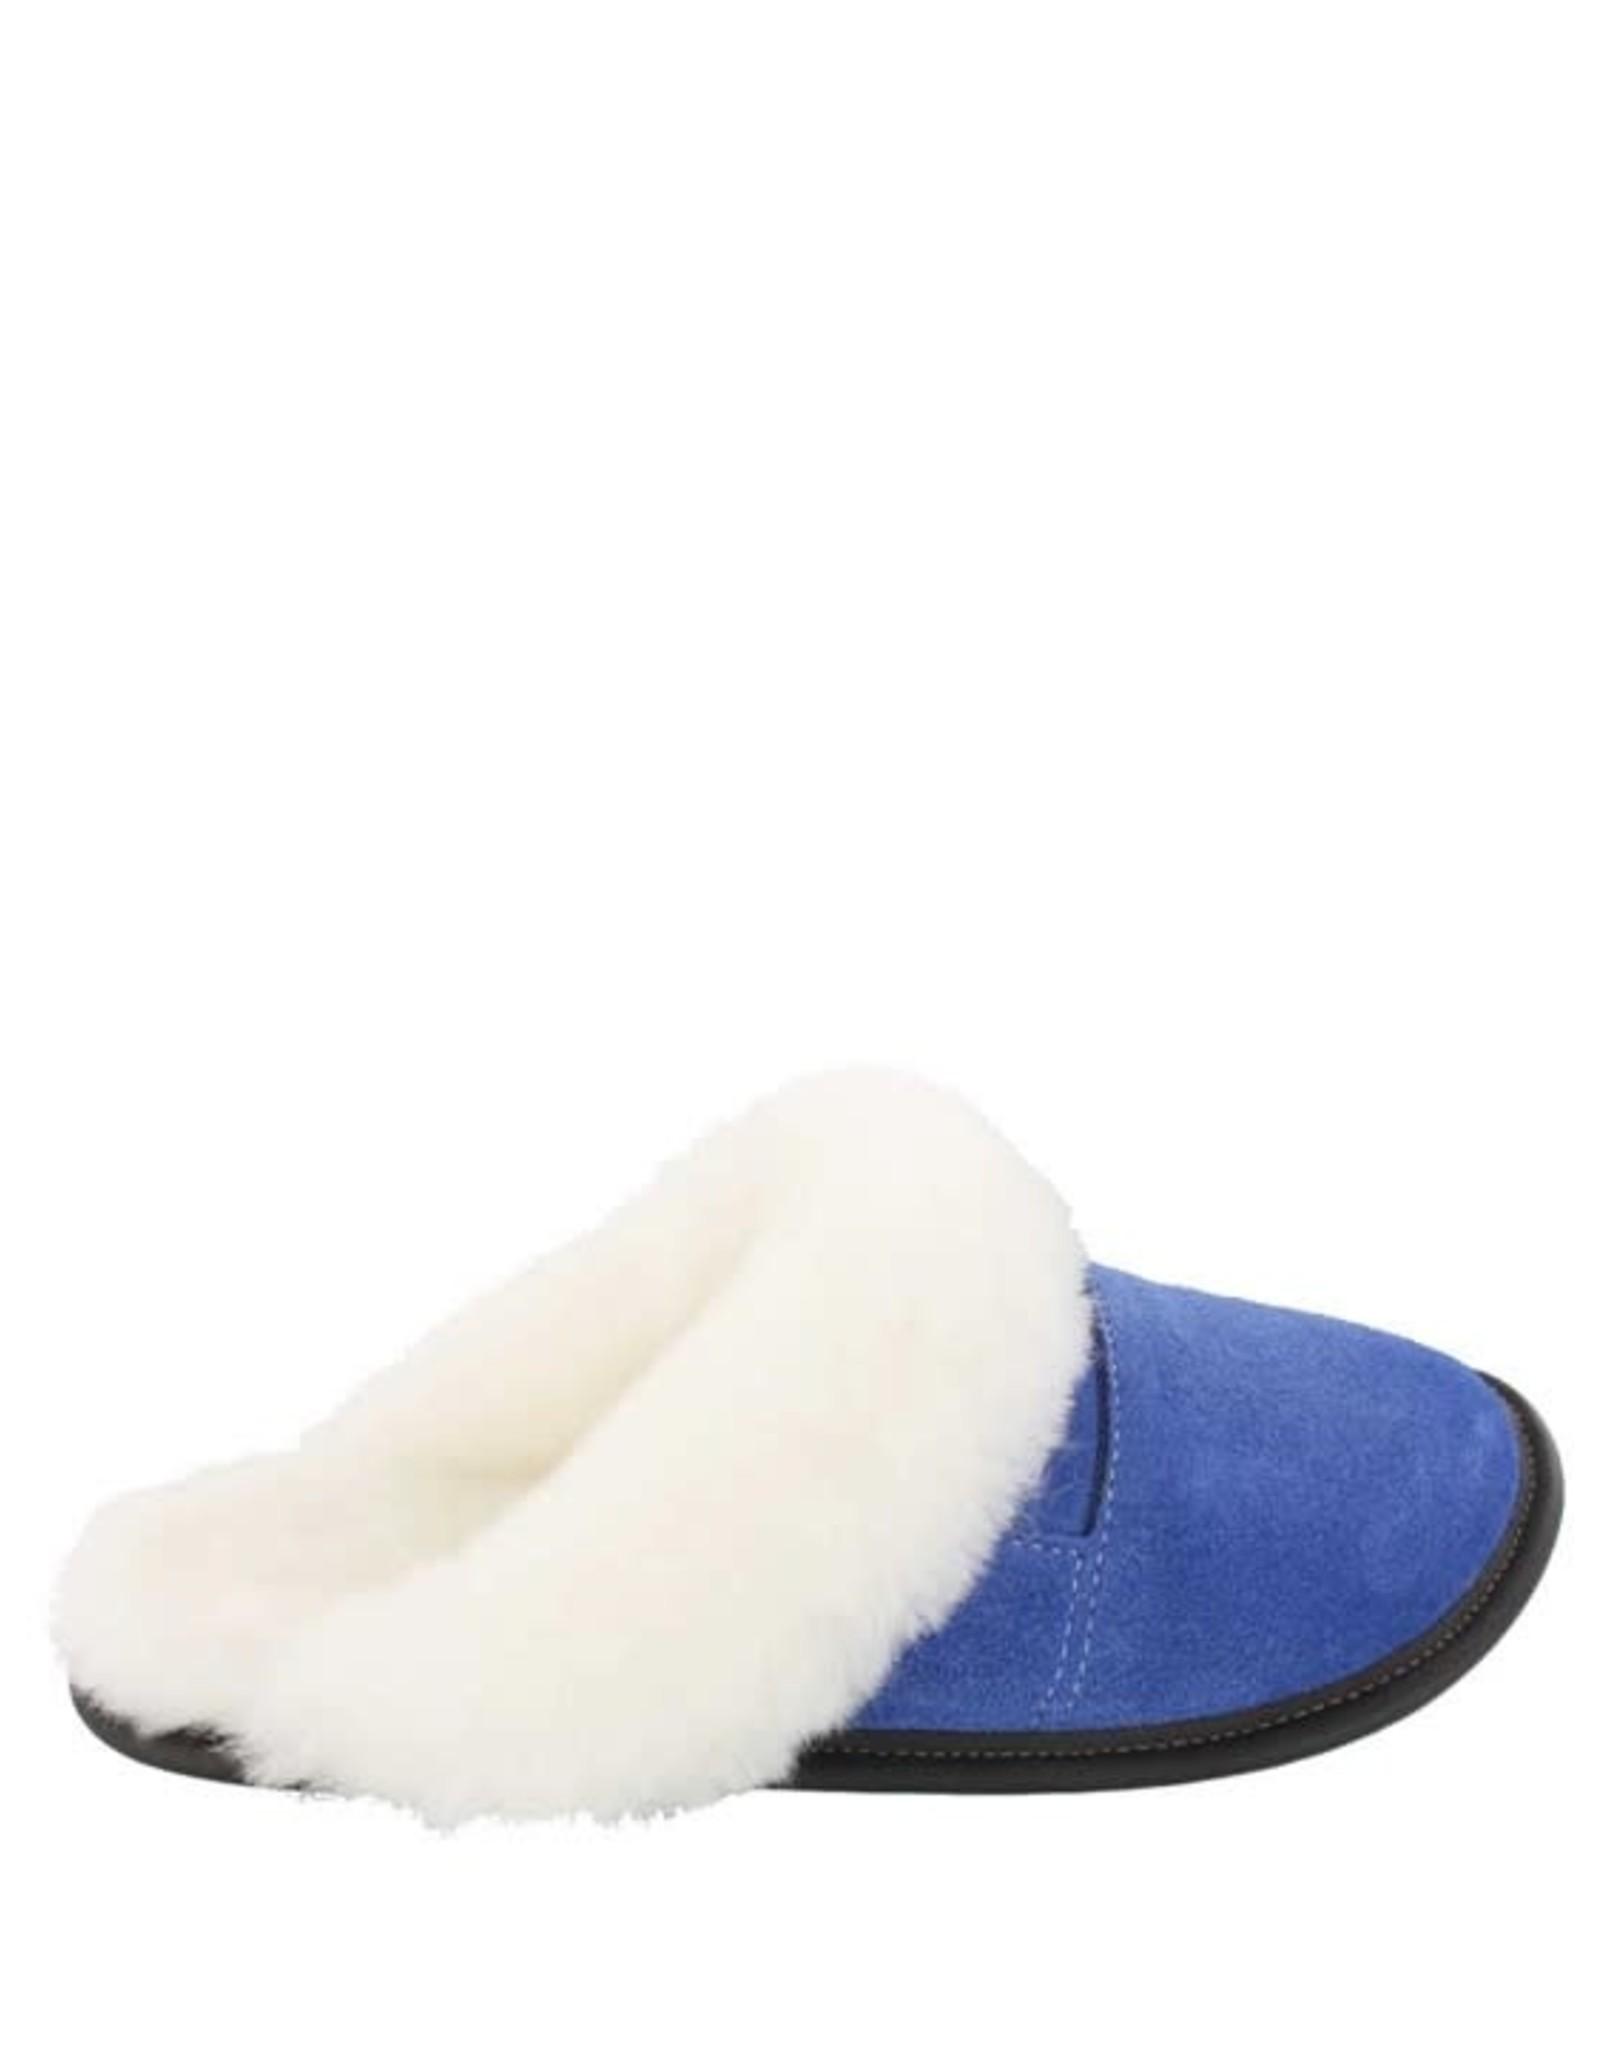 Garneau Pantoufle mule bleu-limoges + Bordure - Femme